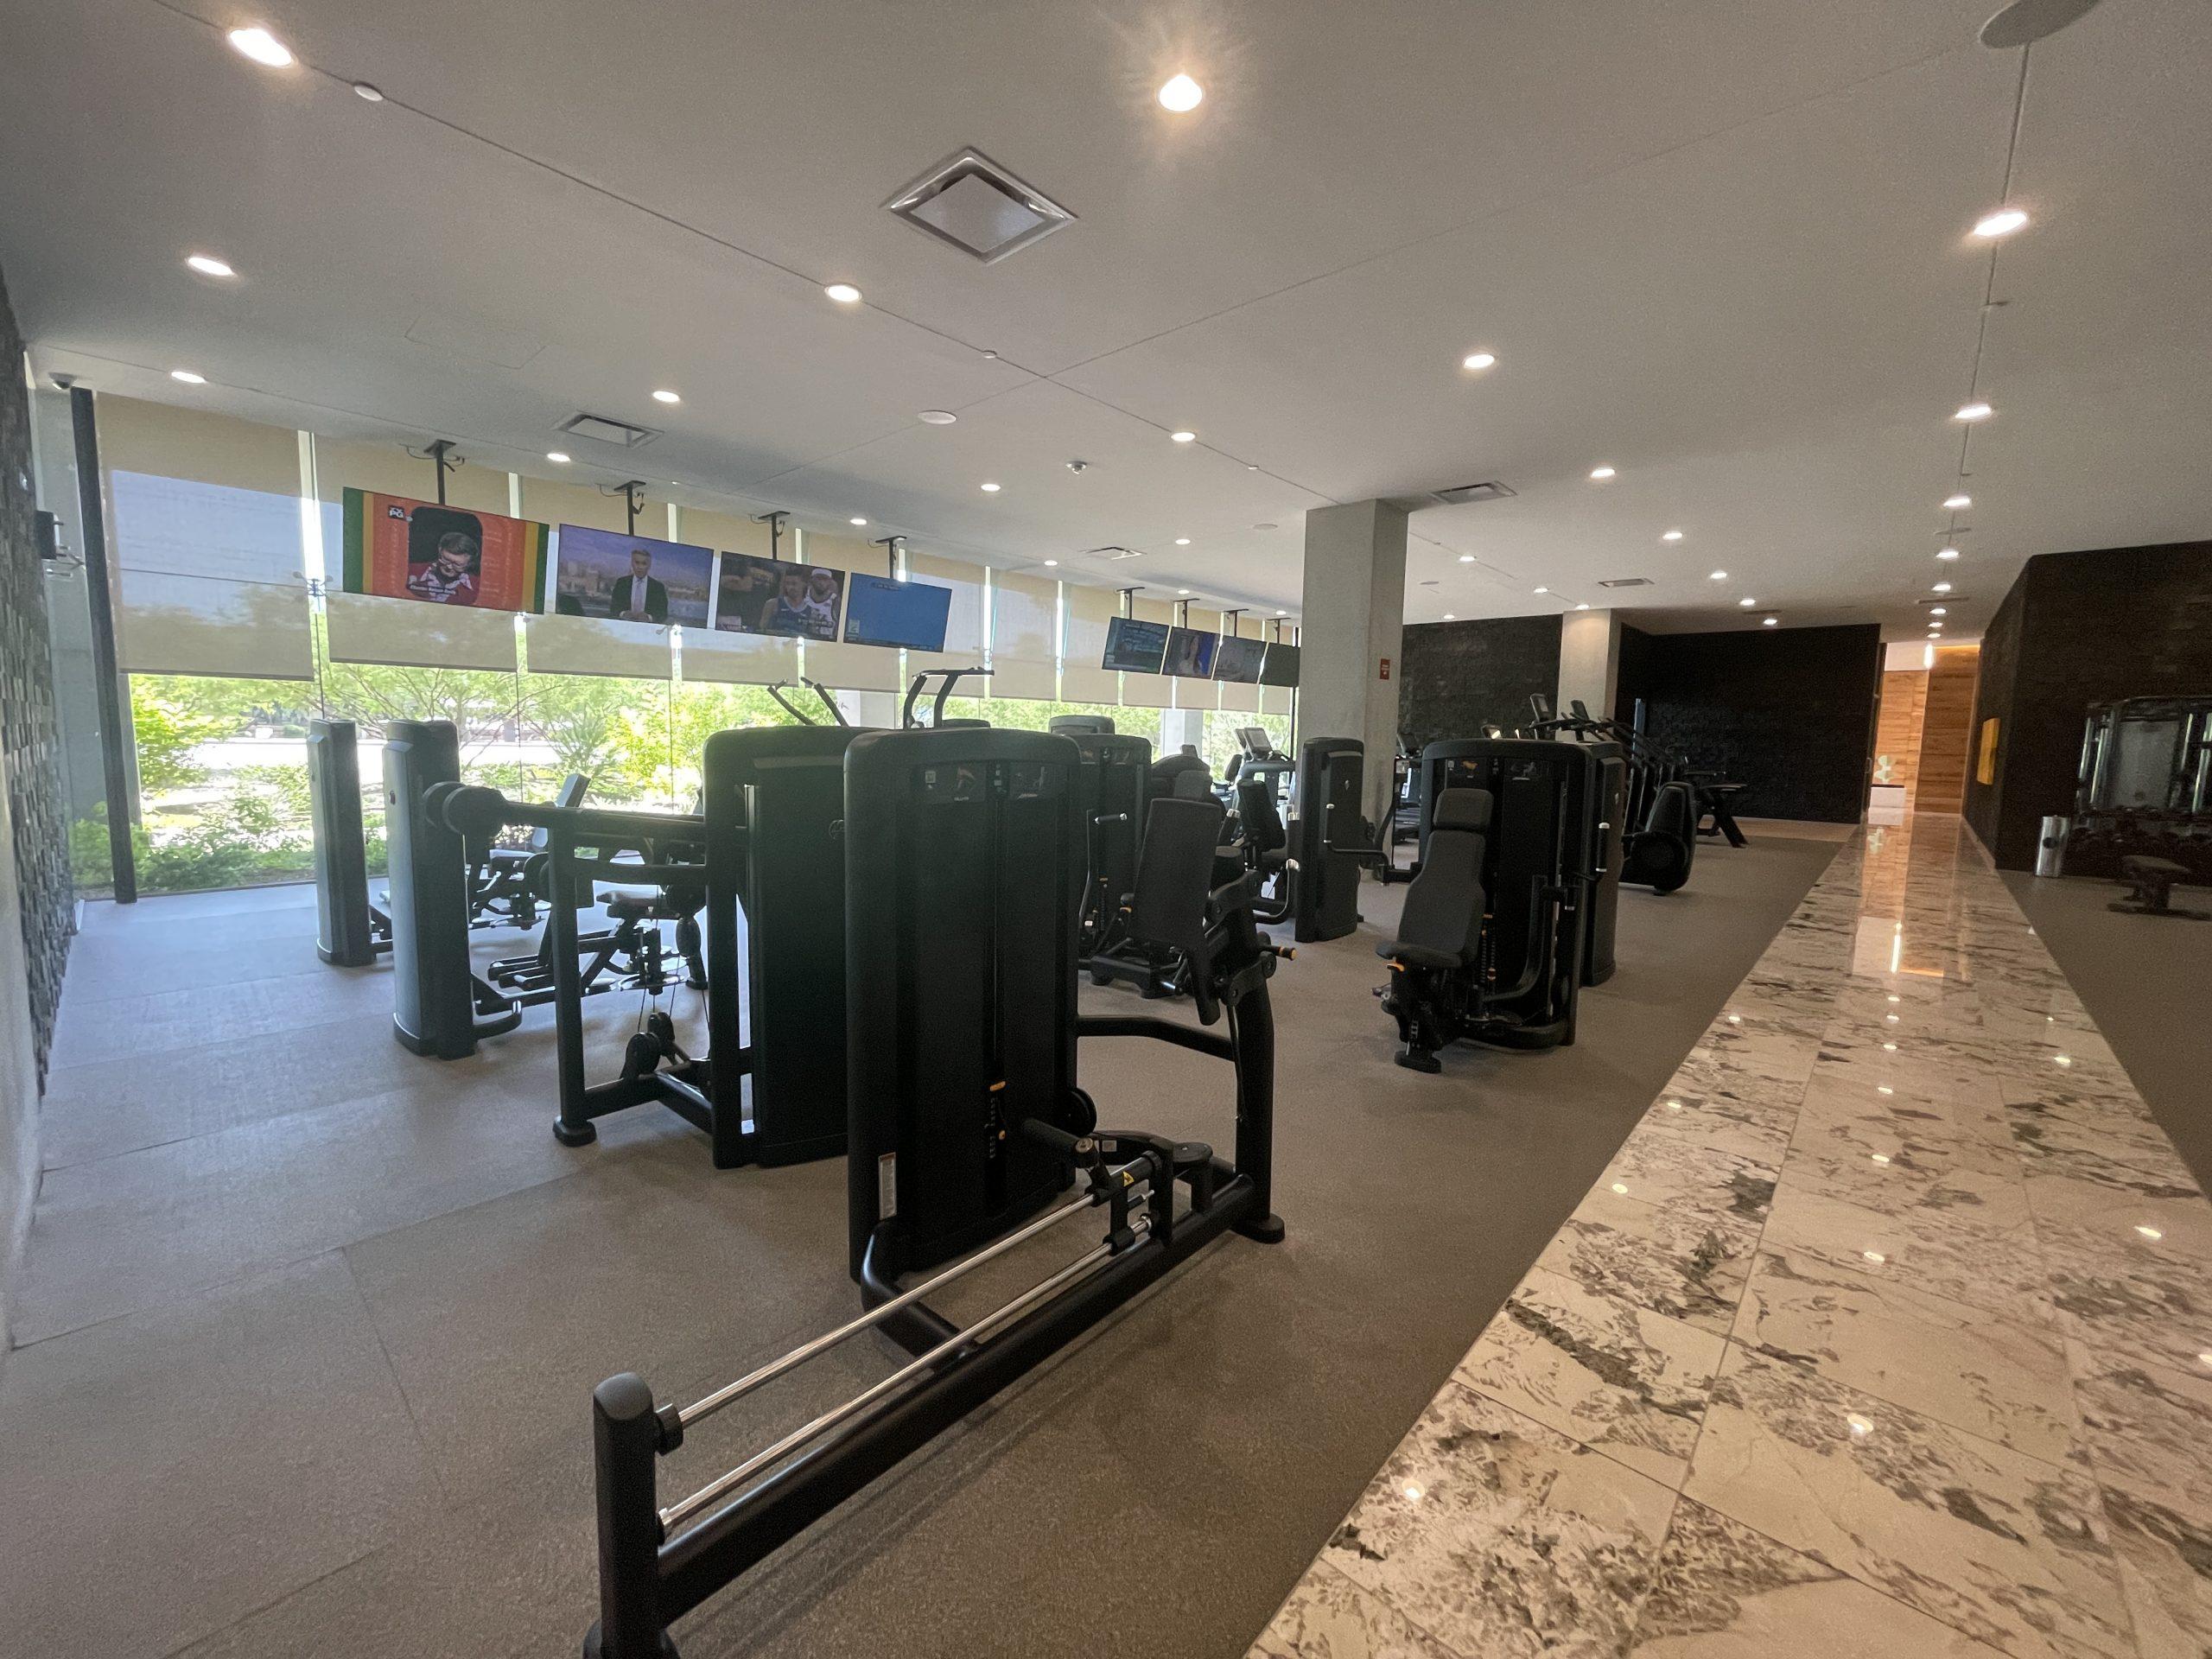 Opotima Kierland Fitness Equipment